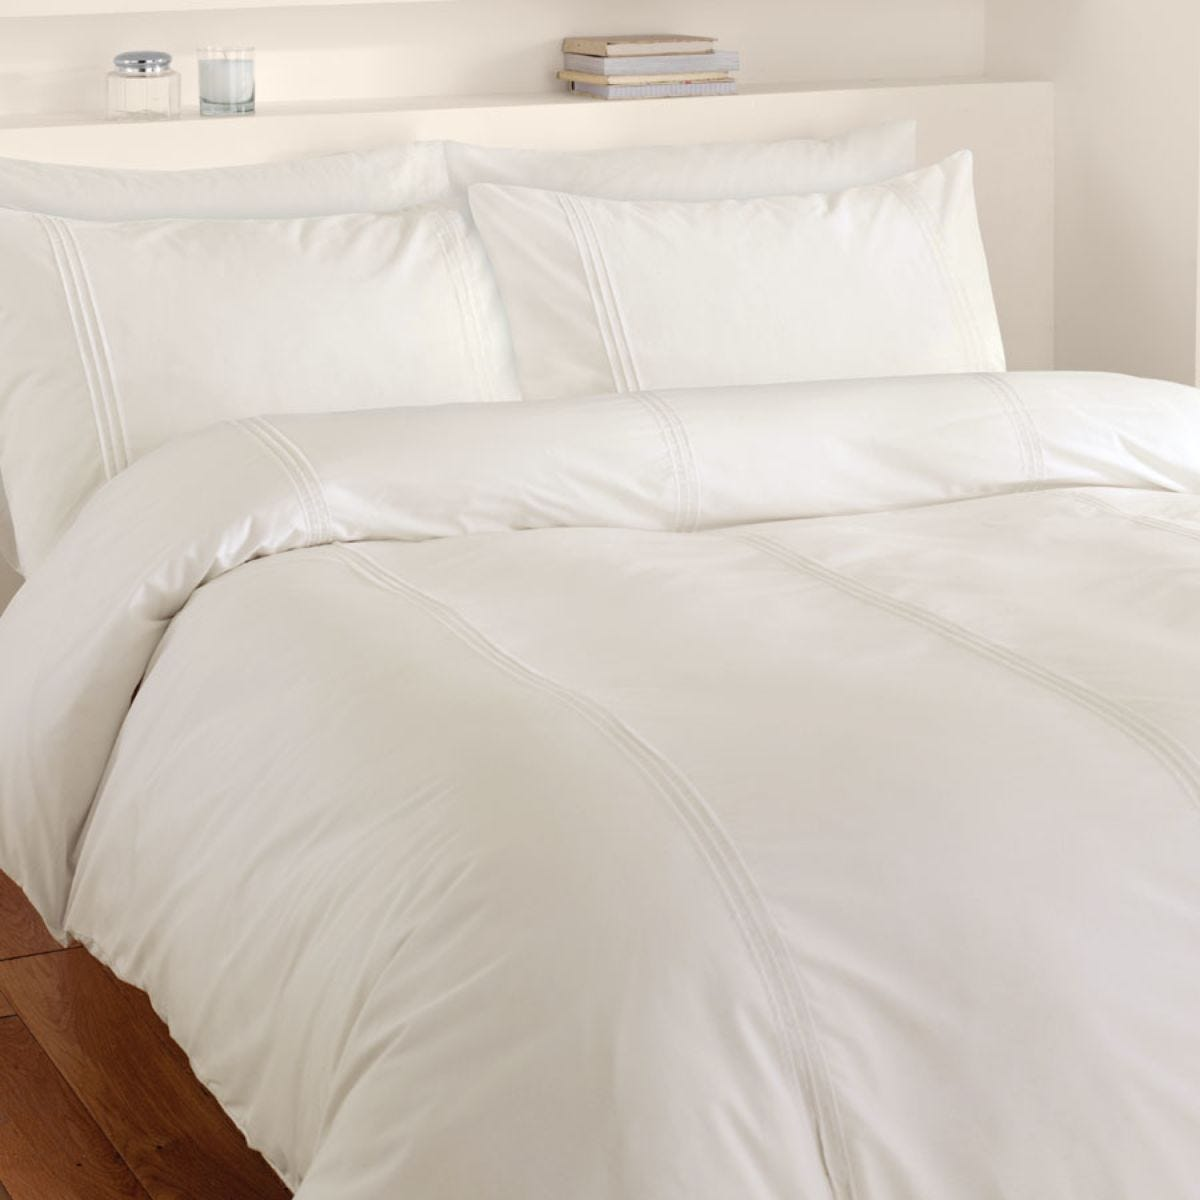 Catherine Lansfield Minimalist Bed Set - Cream